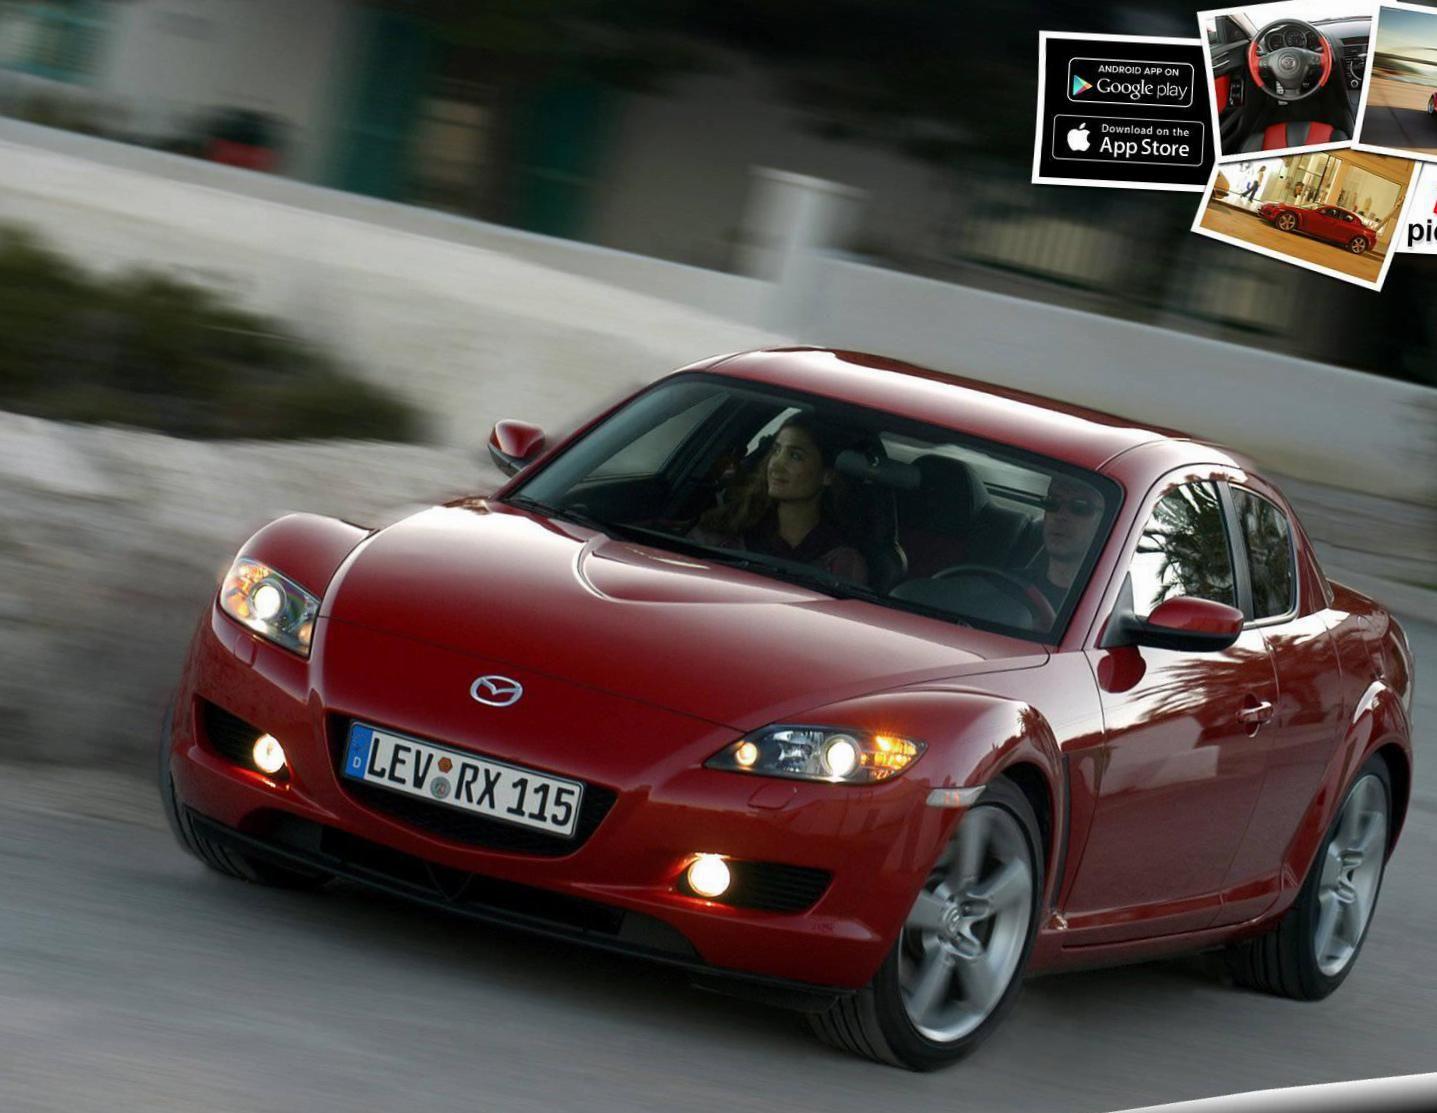 Mazda Rx 8 Photos And Specs Photo Mazda Rx 8 Usa And 26 Perfect Photos Of Mazda Rx 8 Mazda Mazda Cars Car Model